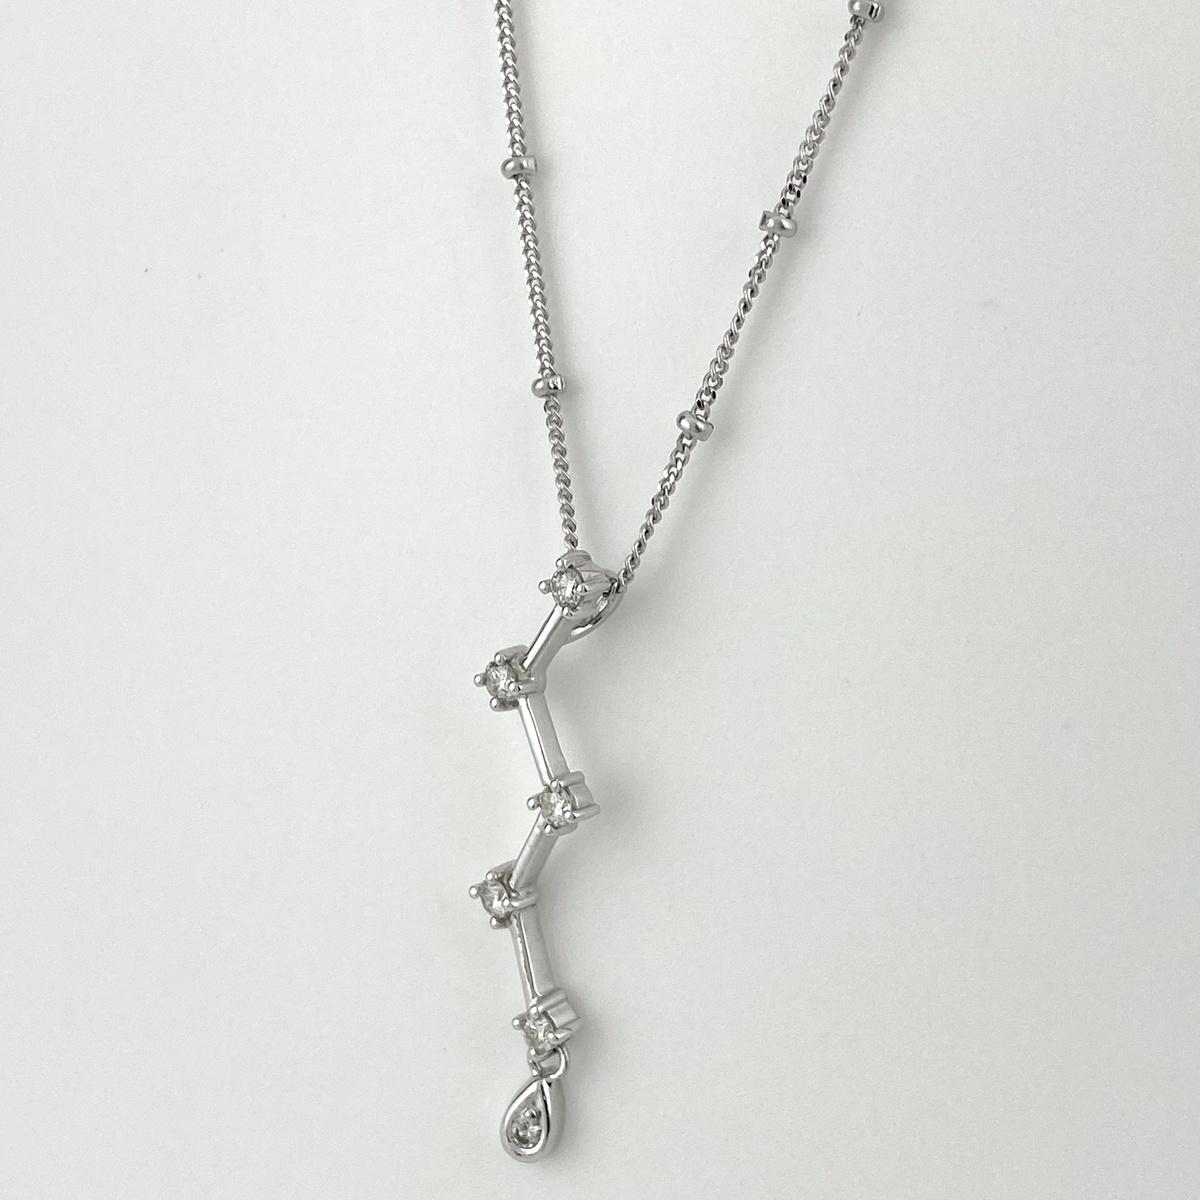 USED 送料無料 メレダイヤ デザインネックレス K18 セール特価 ホワイトゴールド レディース ネックレス ペンダント WG ダイヤモンド 中古 人気上昇中